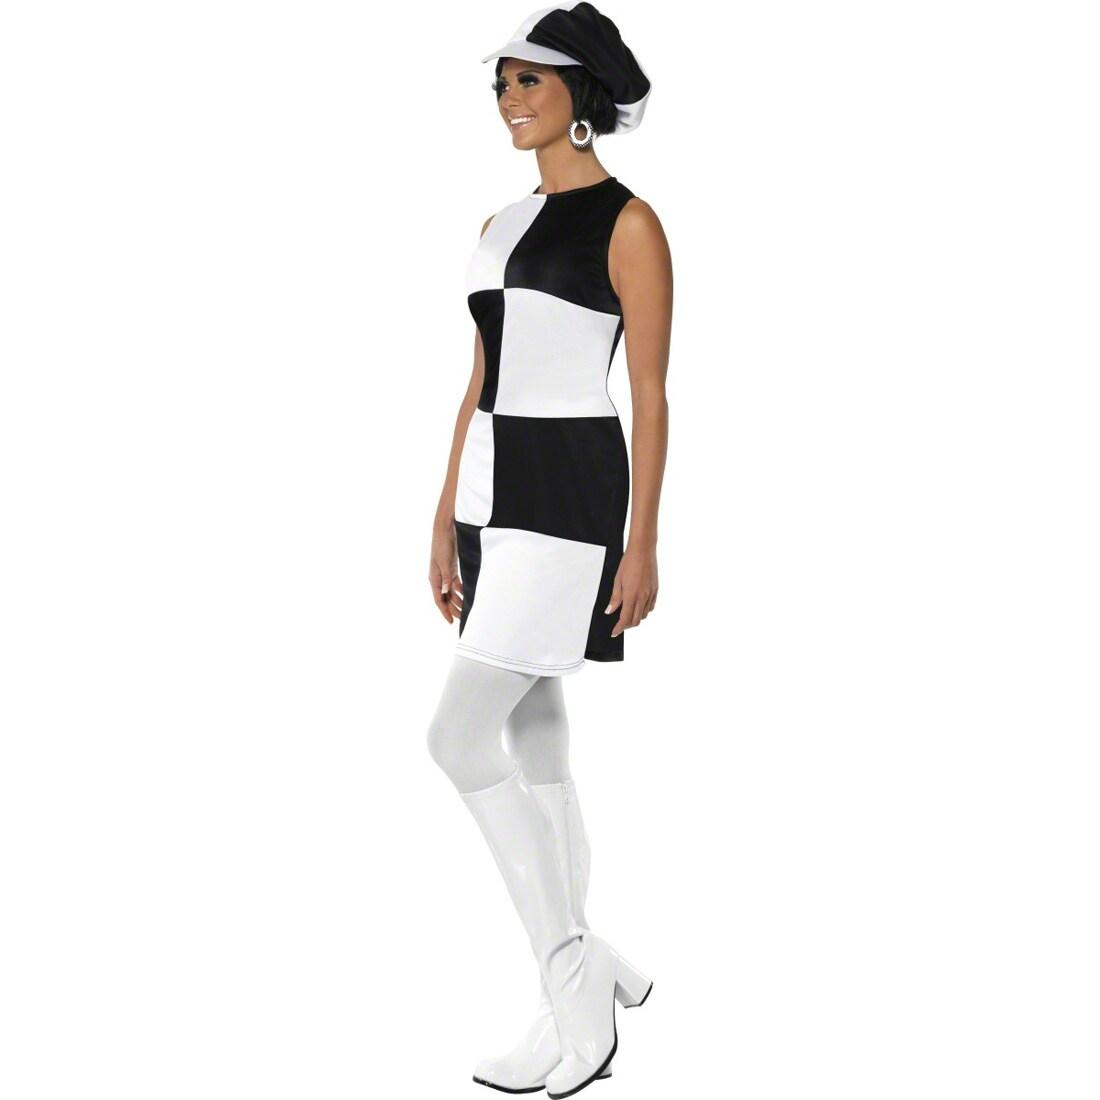 party girl outfit sechziger jahre kost m wei schwarz m 40. Black Bedroom Furniture Sets. Home Design Ideas